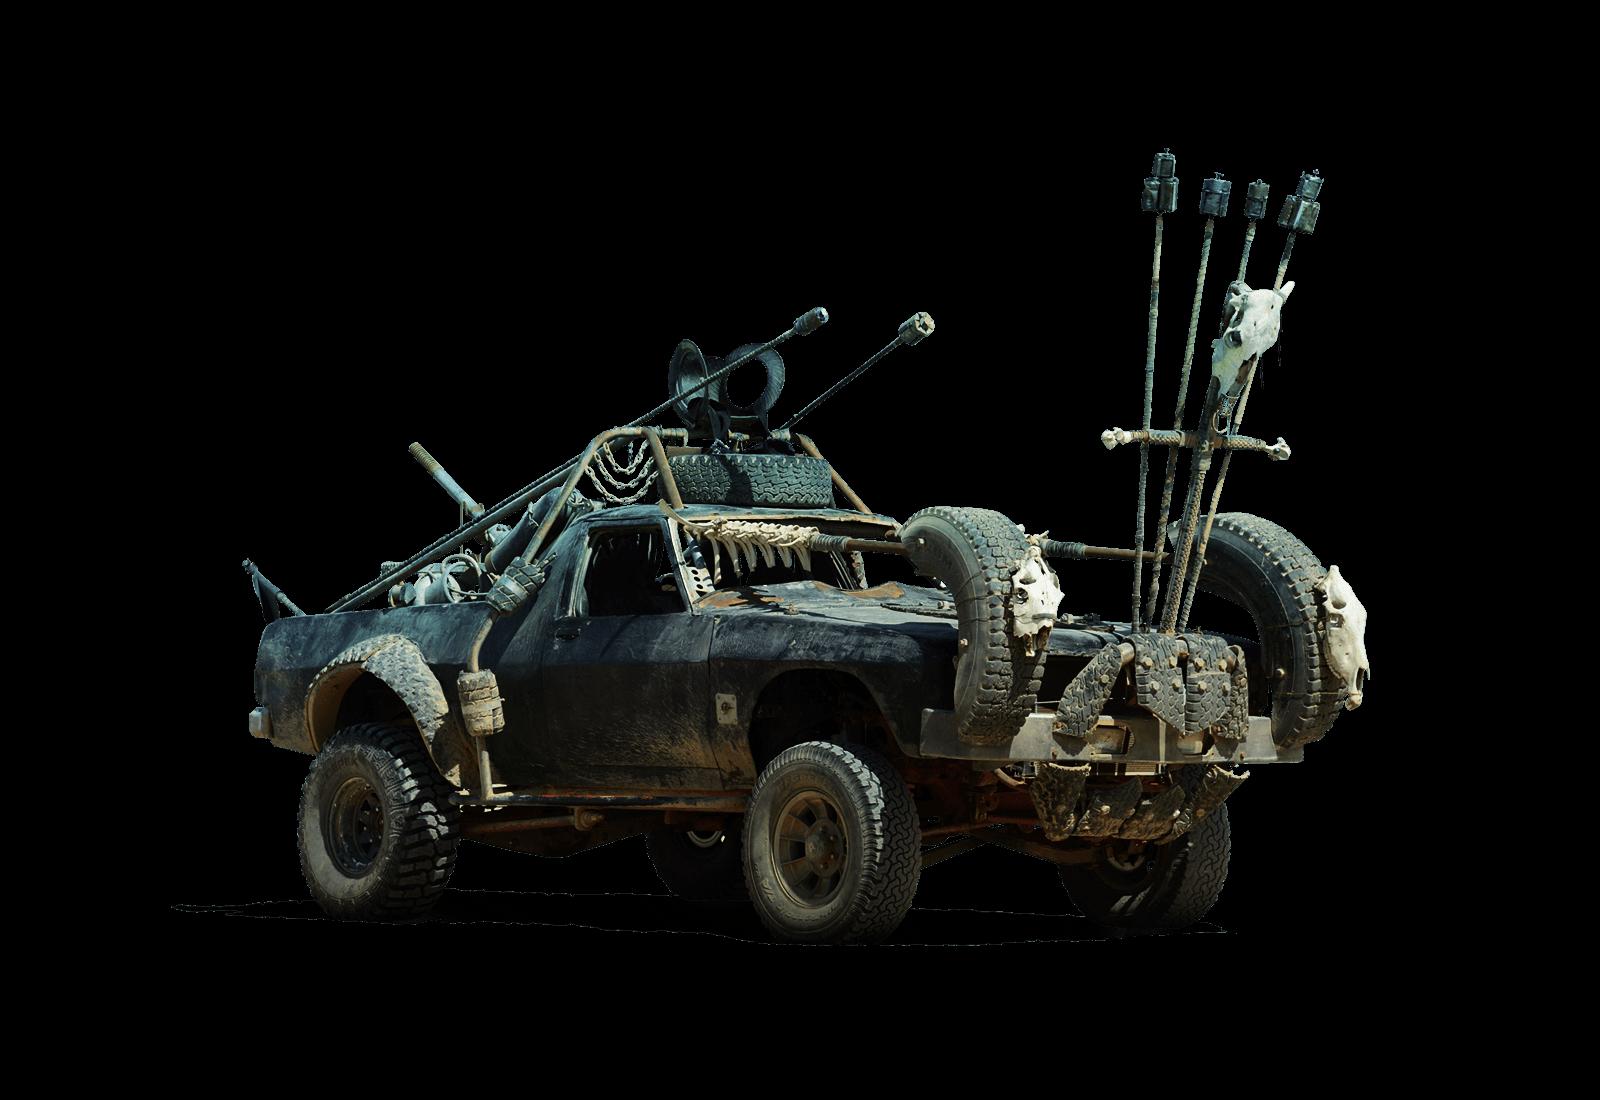 Battle vehicle converted car mad max car